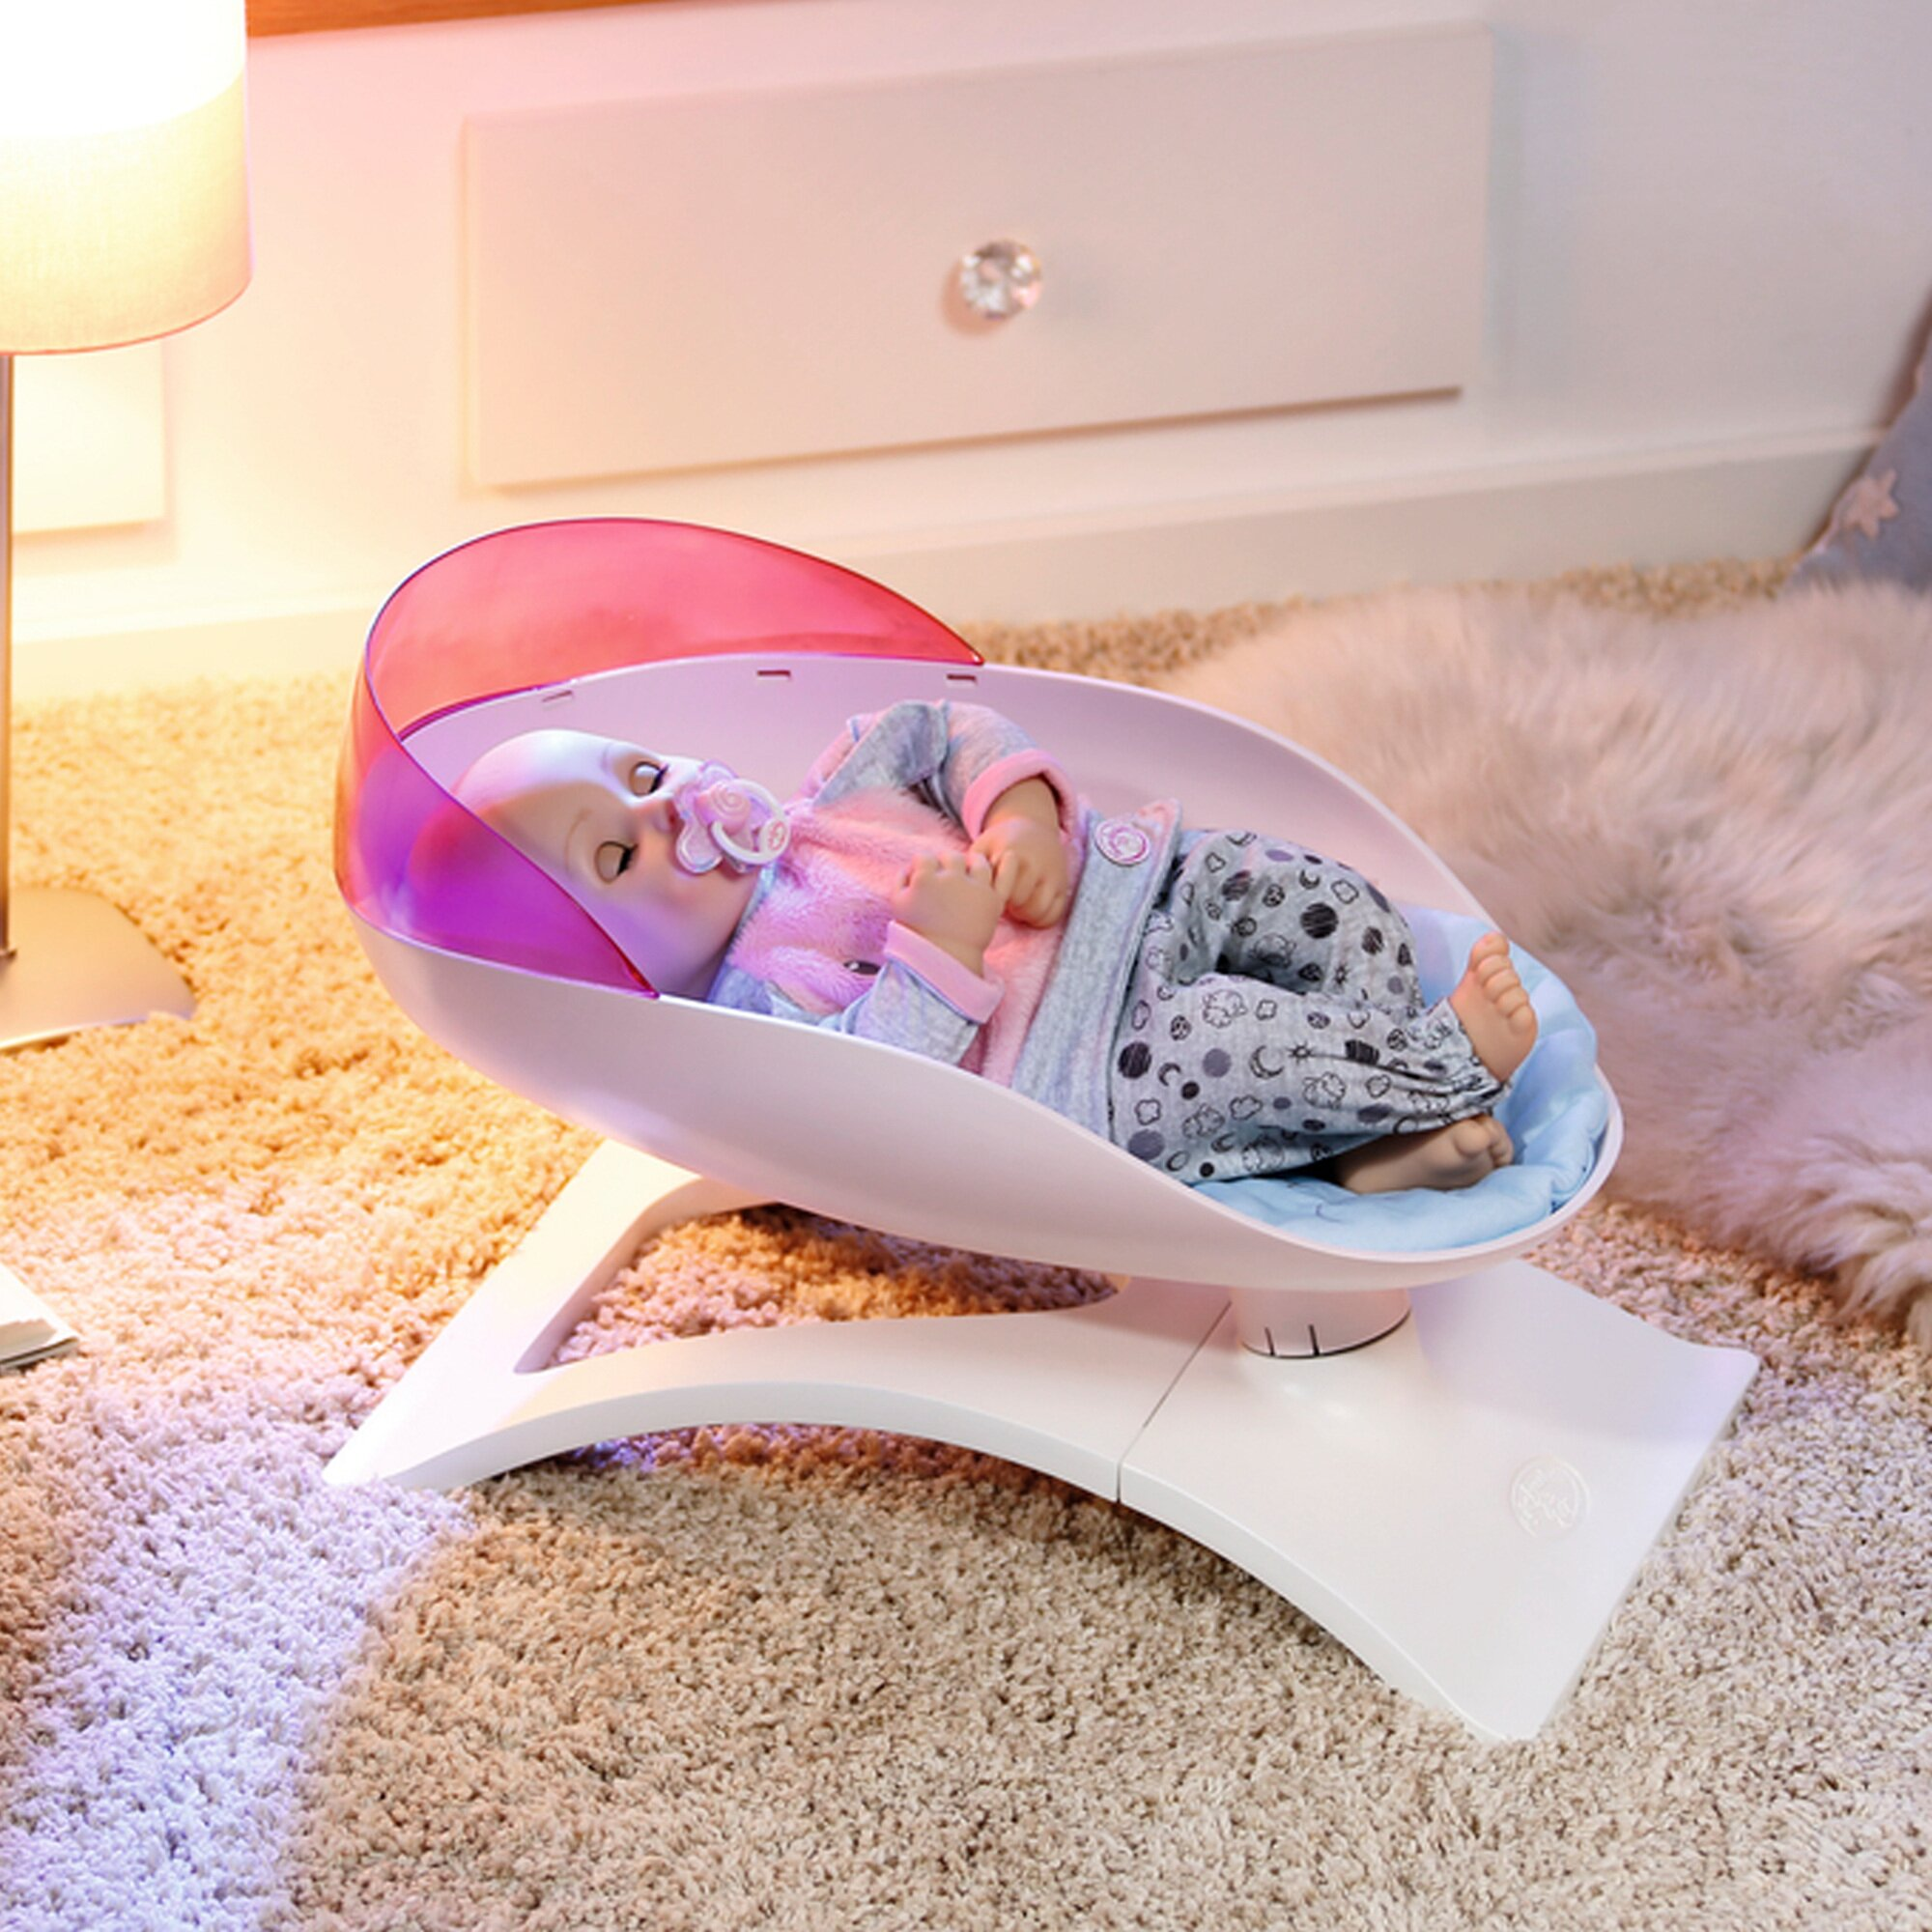 baby-annabell-babyschaukel-sweet-dreams